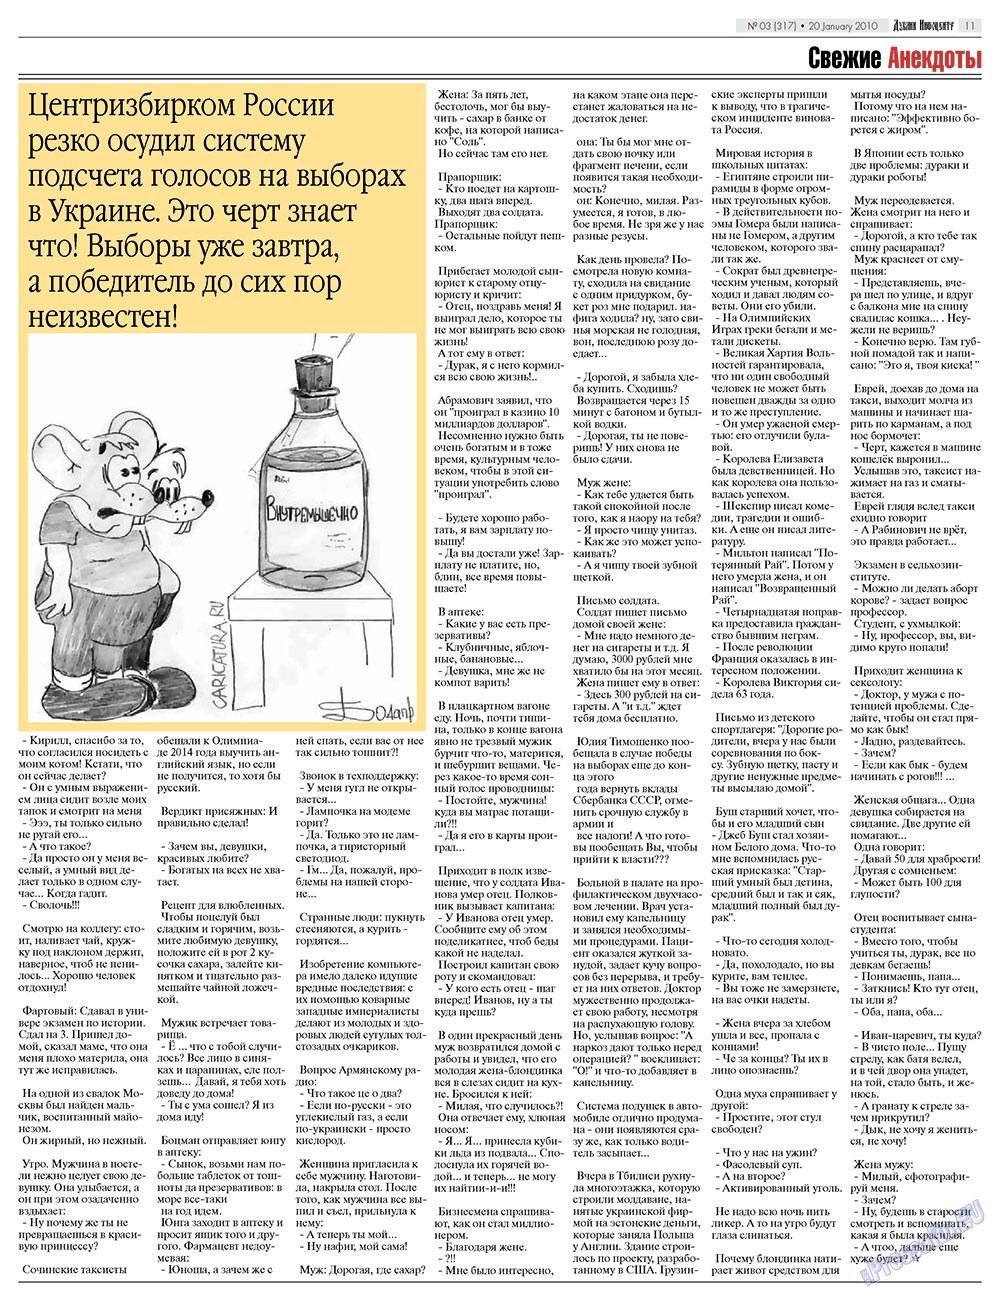 Дублин инфоцентр (газета). 2010 год, номер 3, стр. 11